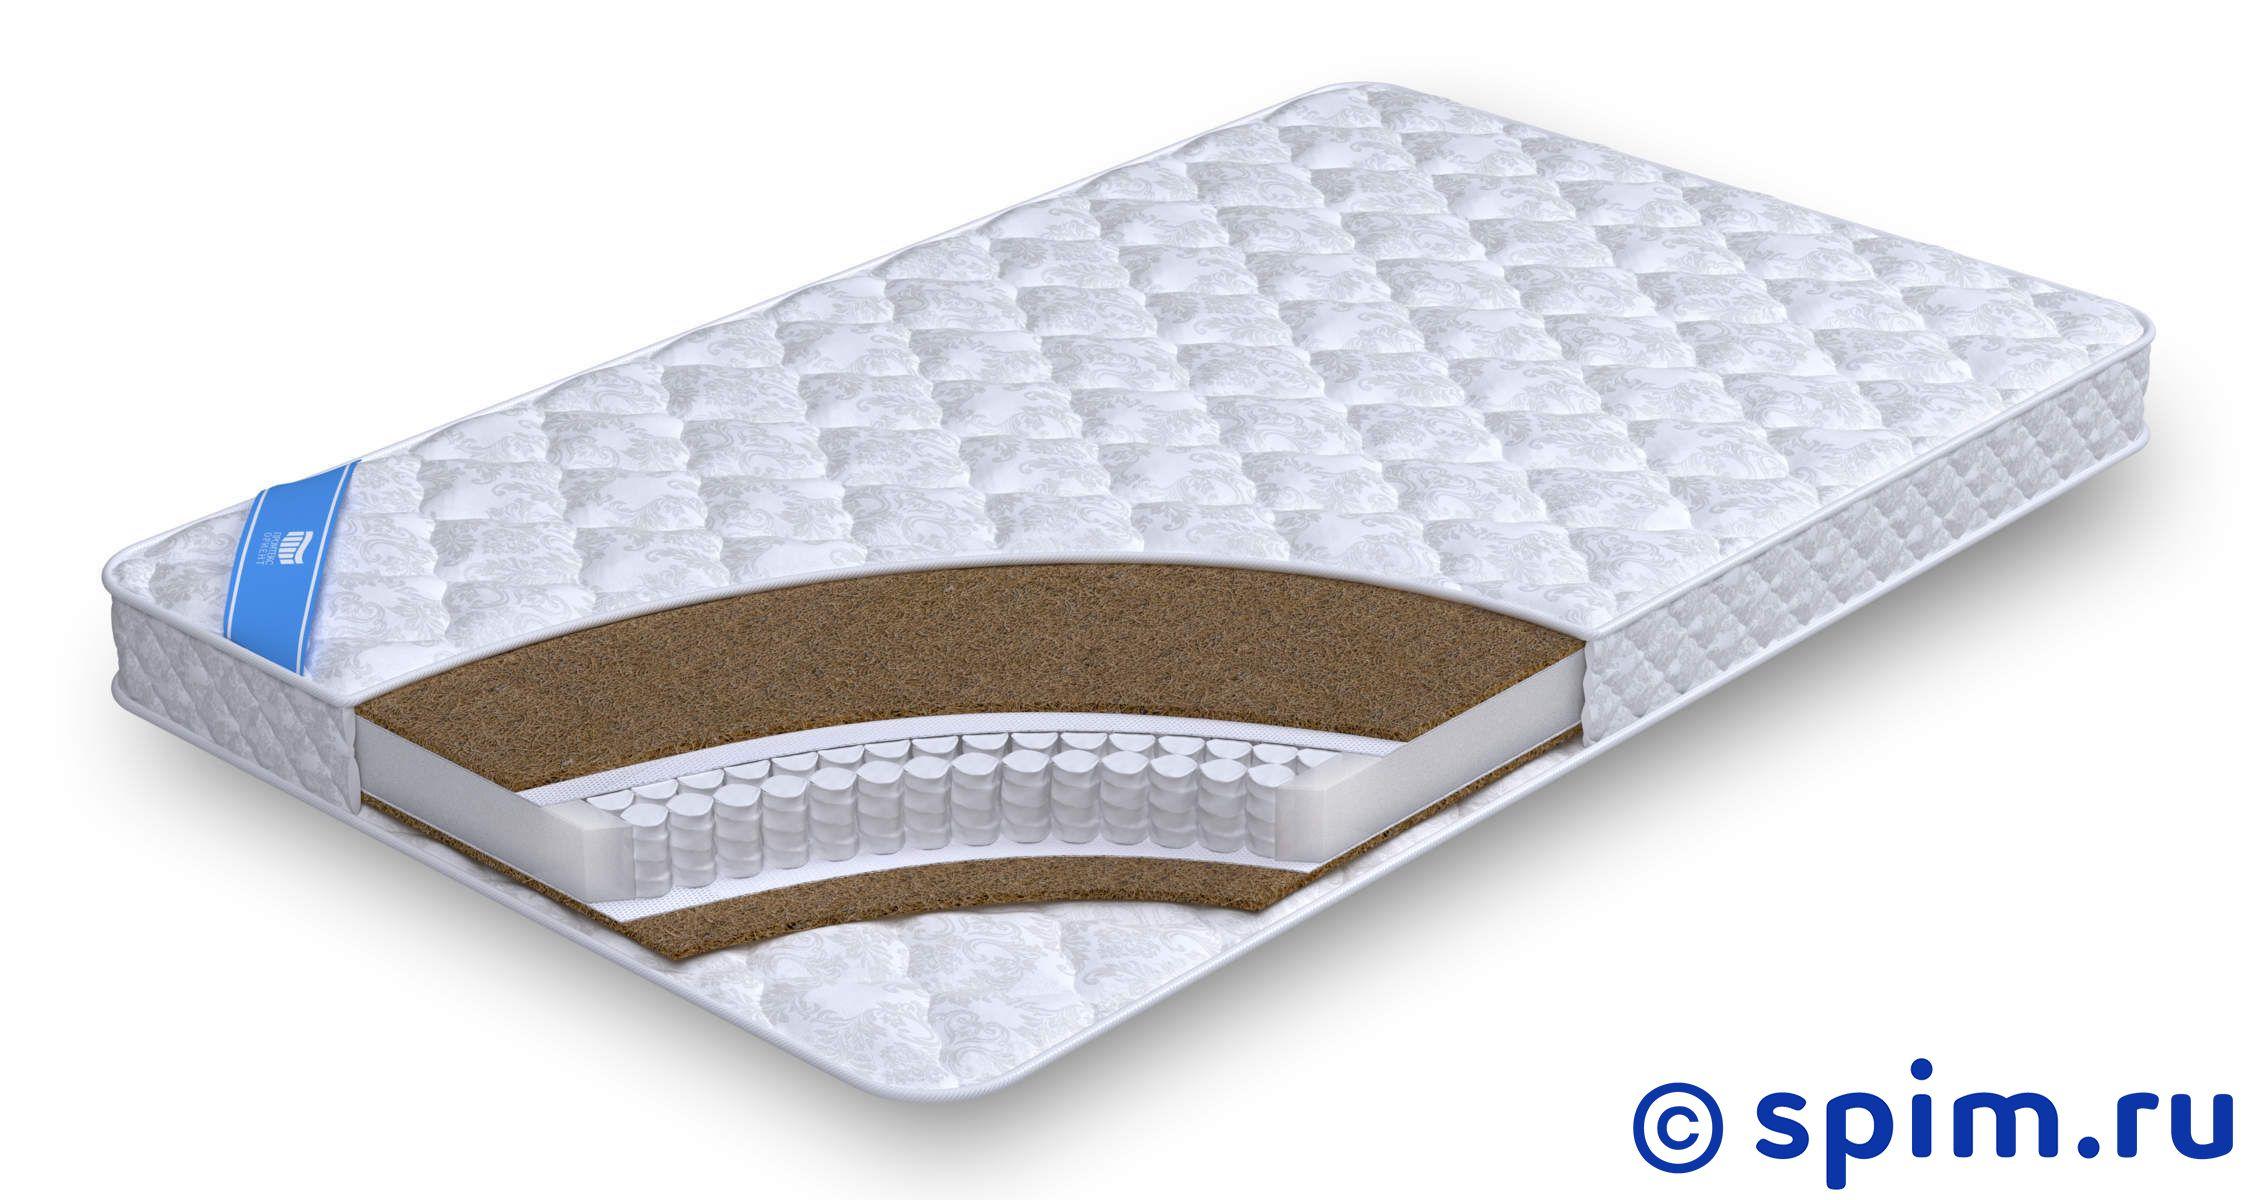 Матрас Промтекс-Ориент Teen Кокос 1 65х125 см кровать промтекс ориент рено 1 110х200 см